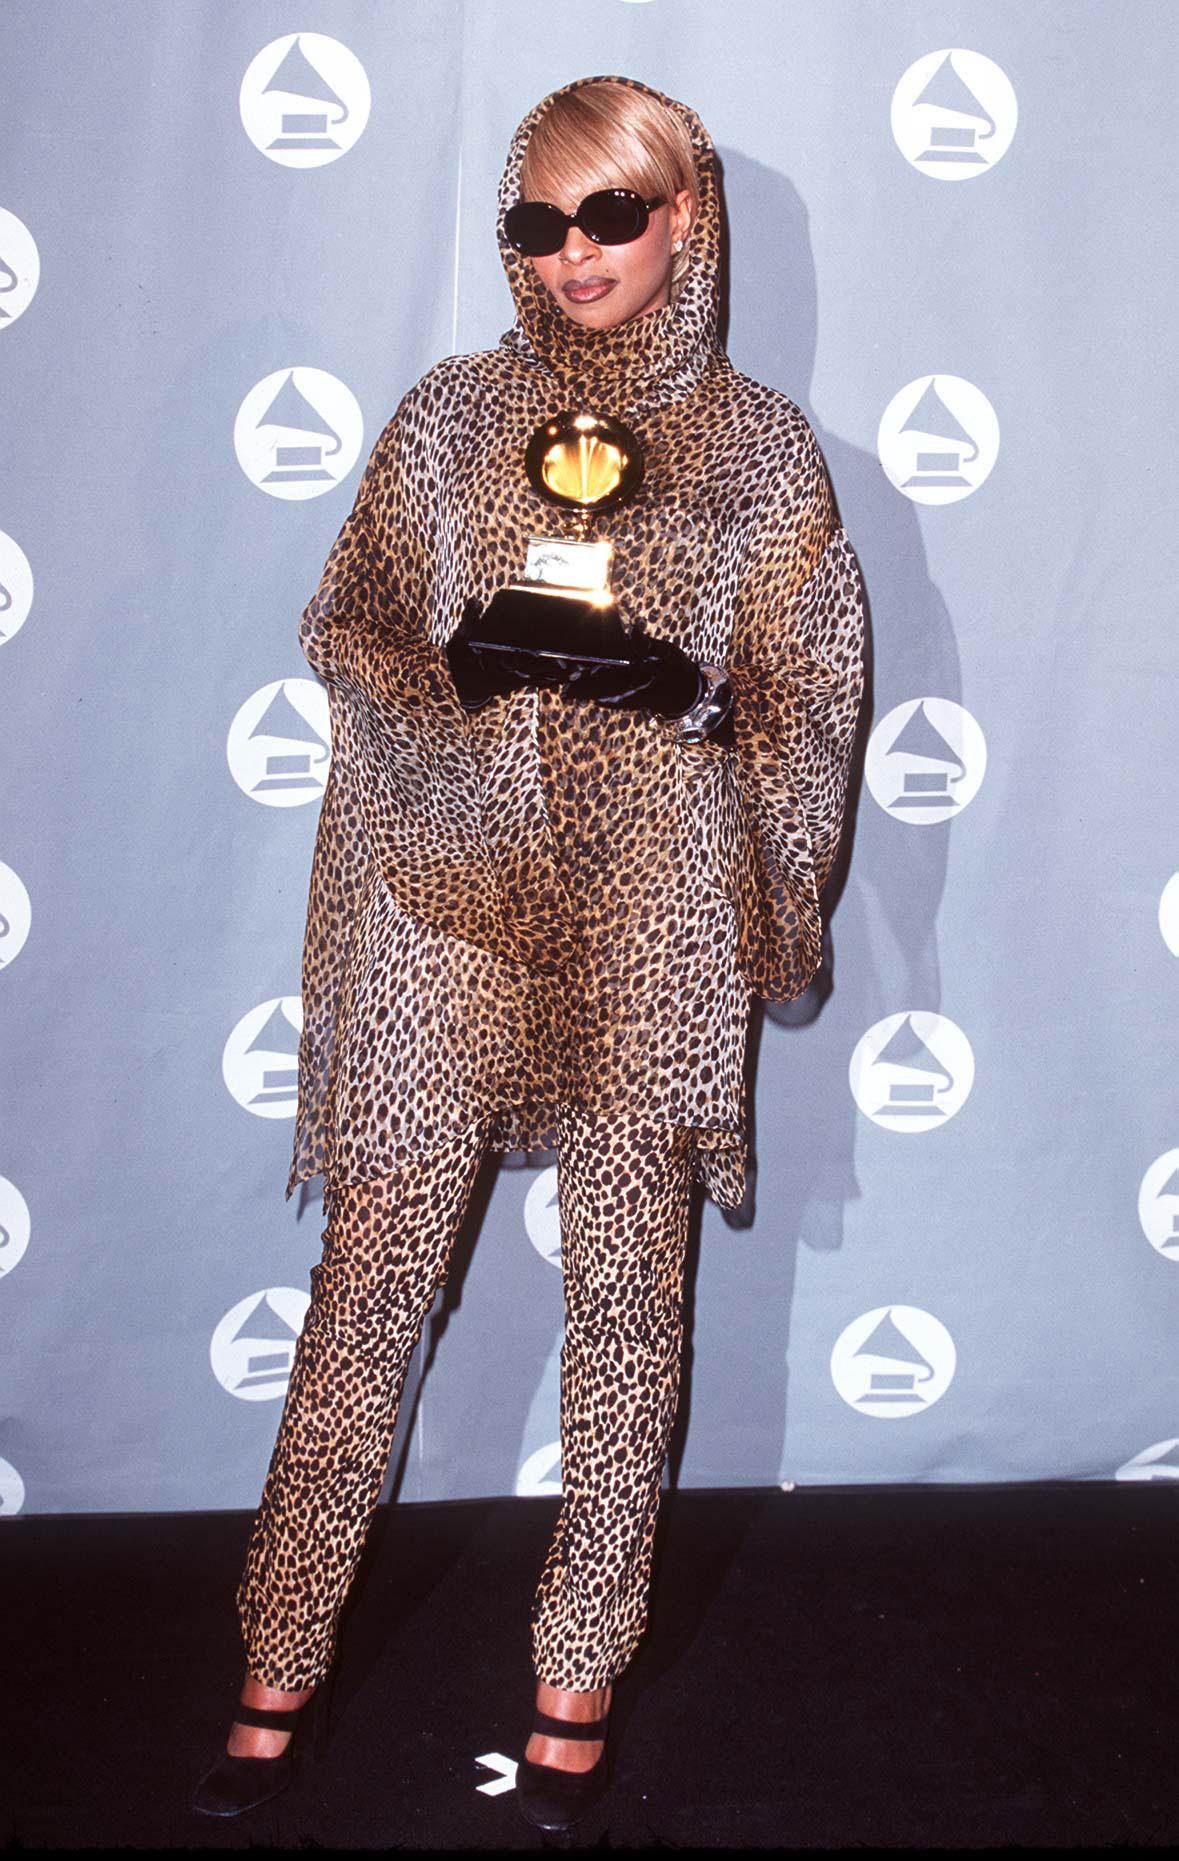 Mary J. Blige at Grammy's